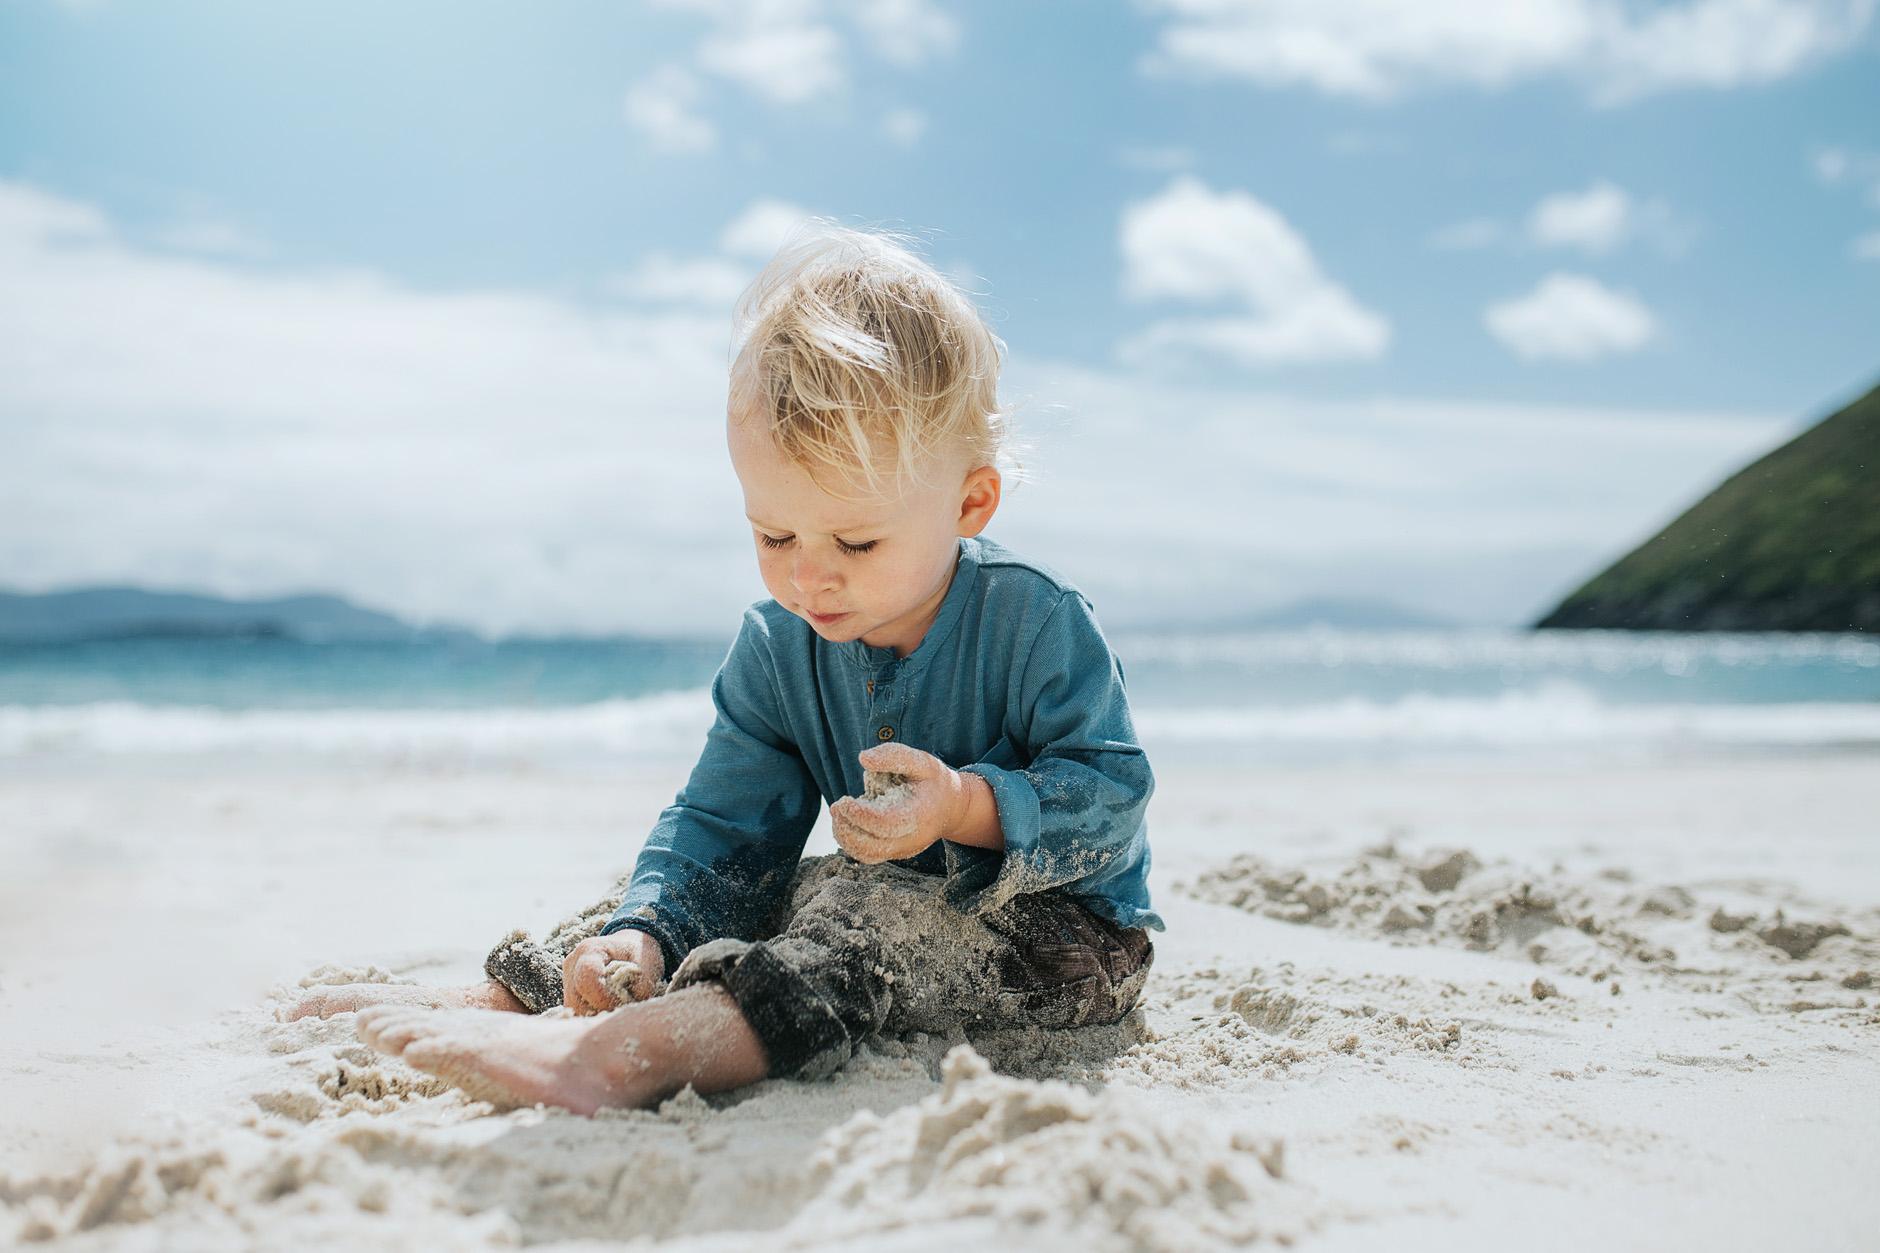 stunning-beach-family-vacation-photoshoot-achill-island-ireland-0019.jpg